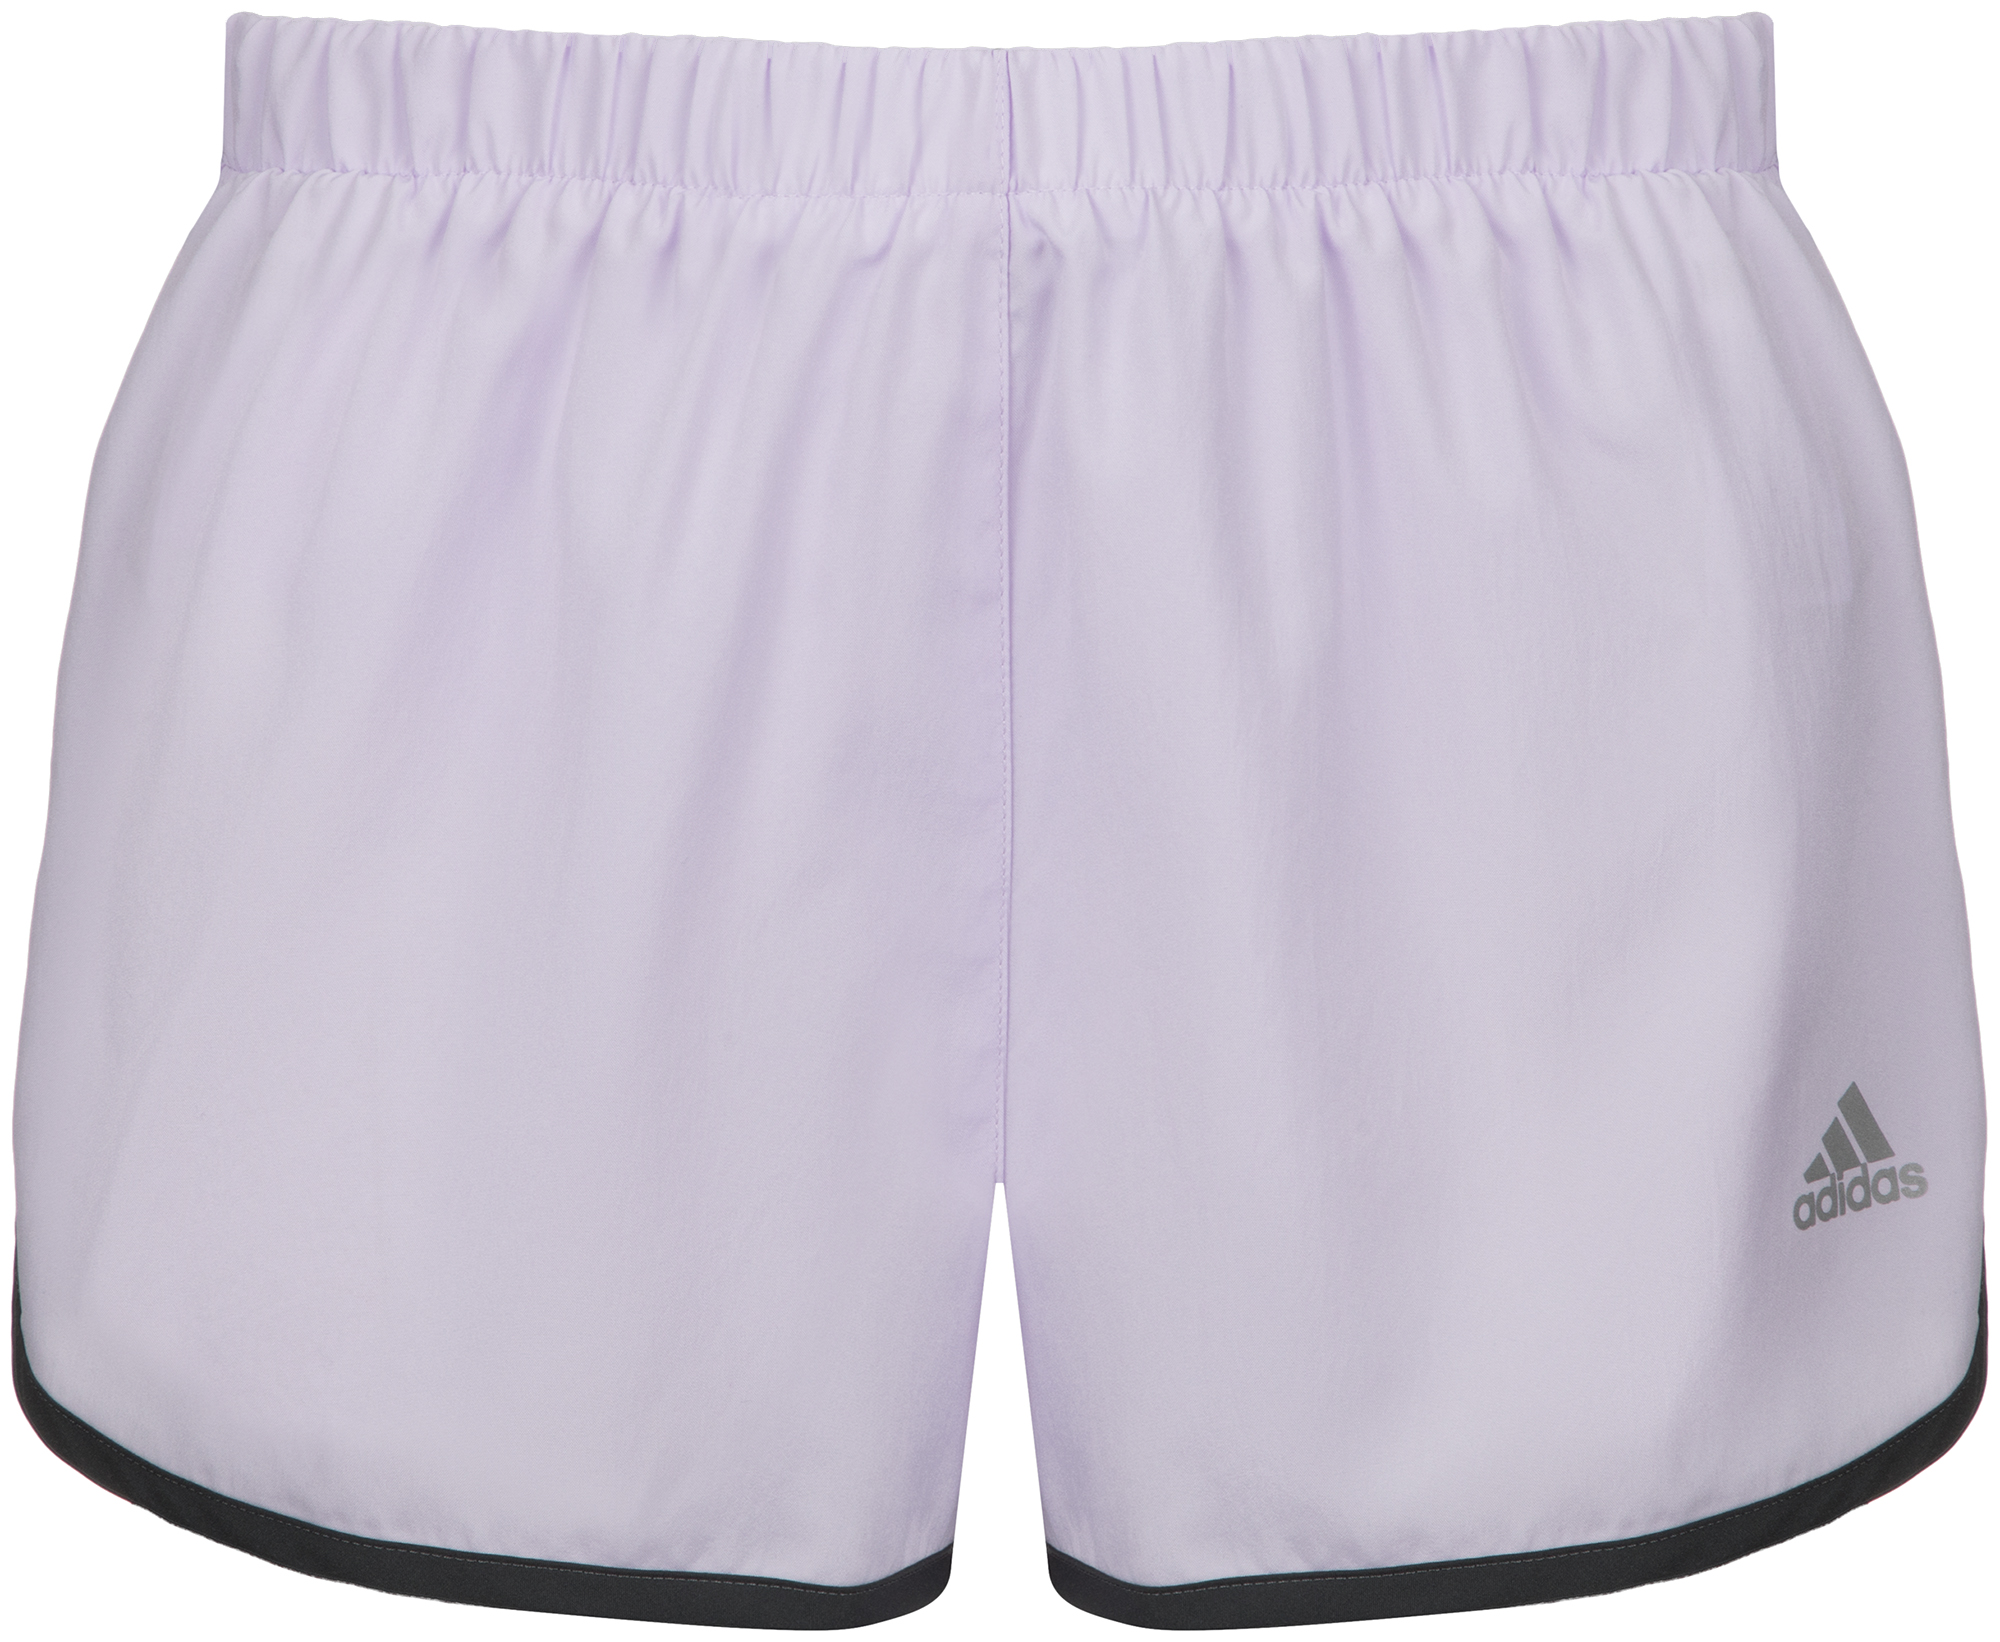 Adidas Шорты женские Adidas Marathon 20, размер 40 шорты для мальчика adidas tiro17 wov shoy цвет черный ay2892 размер 128